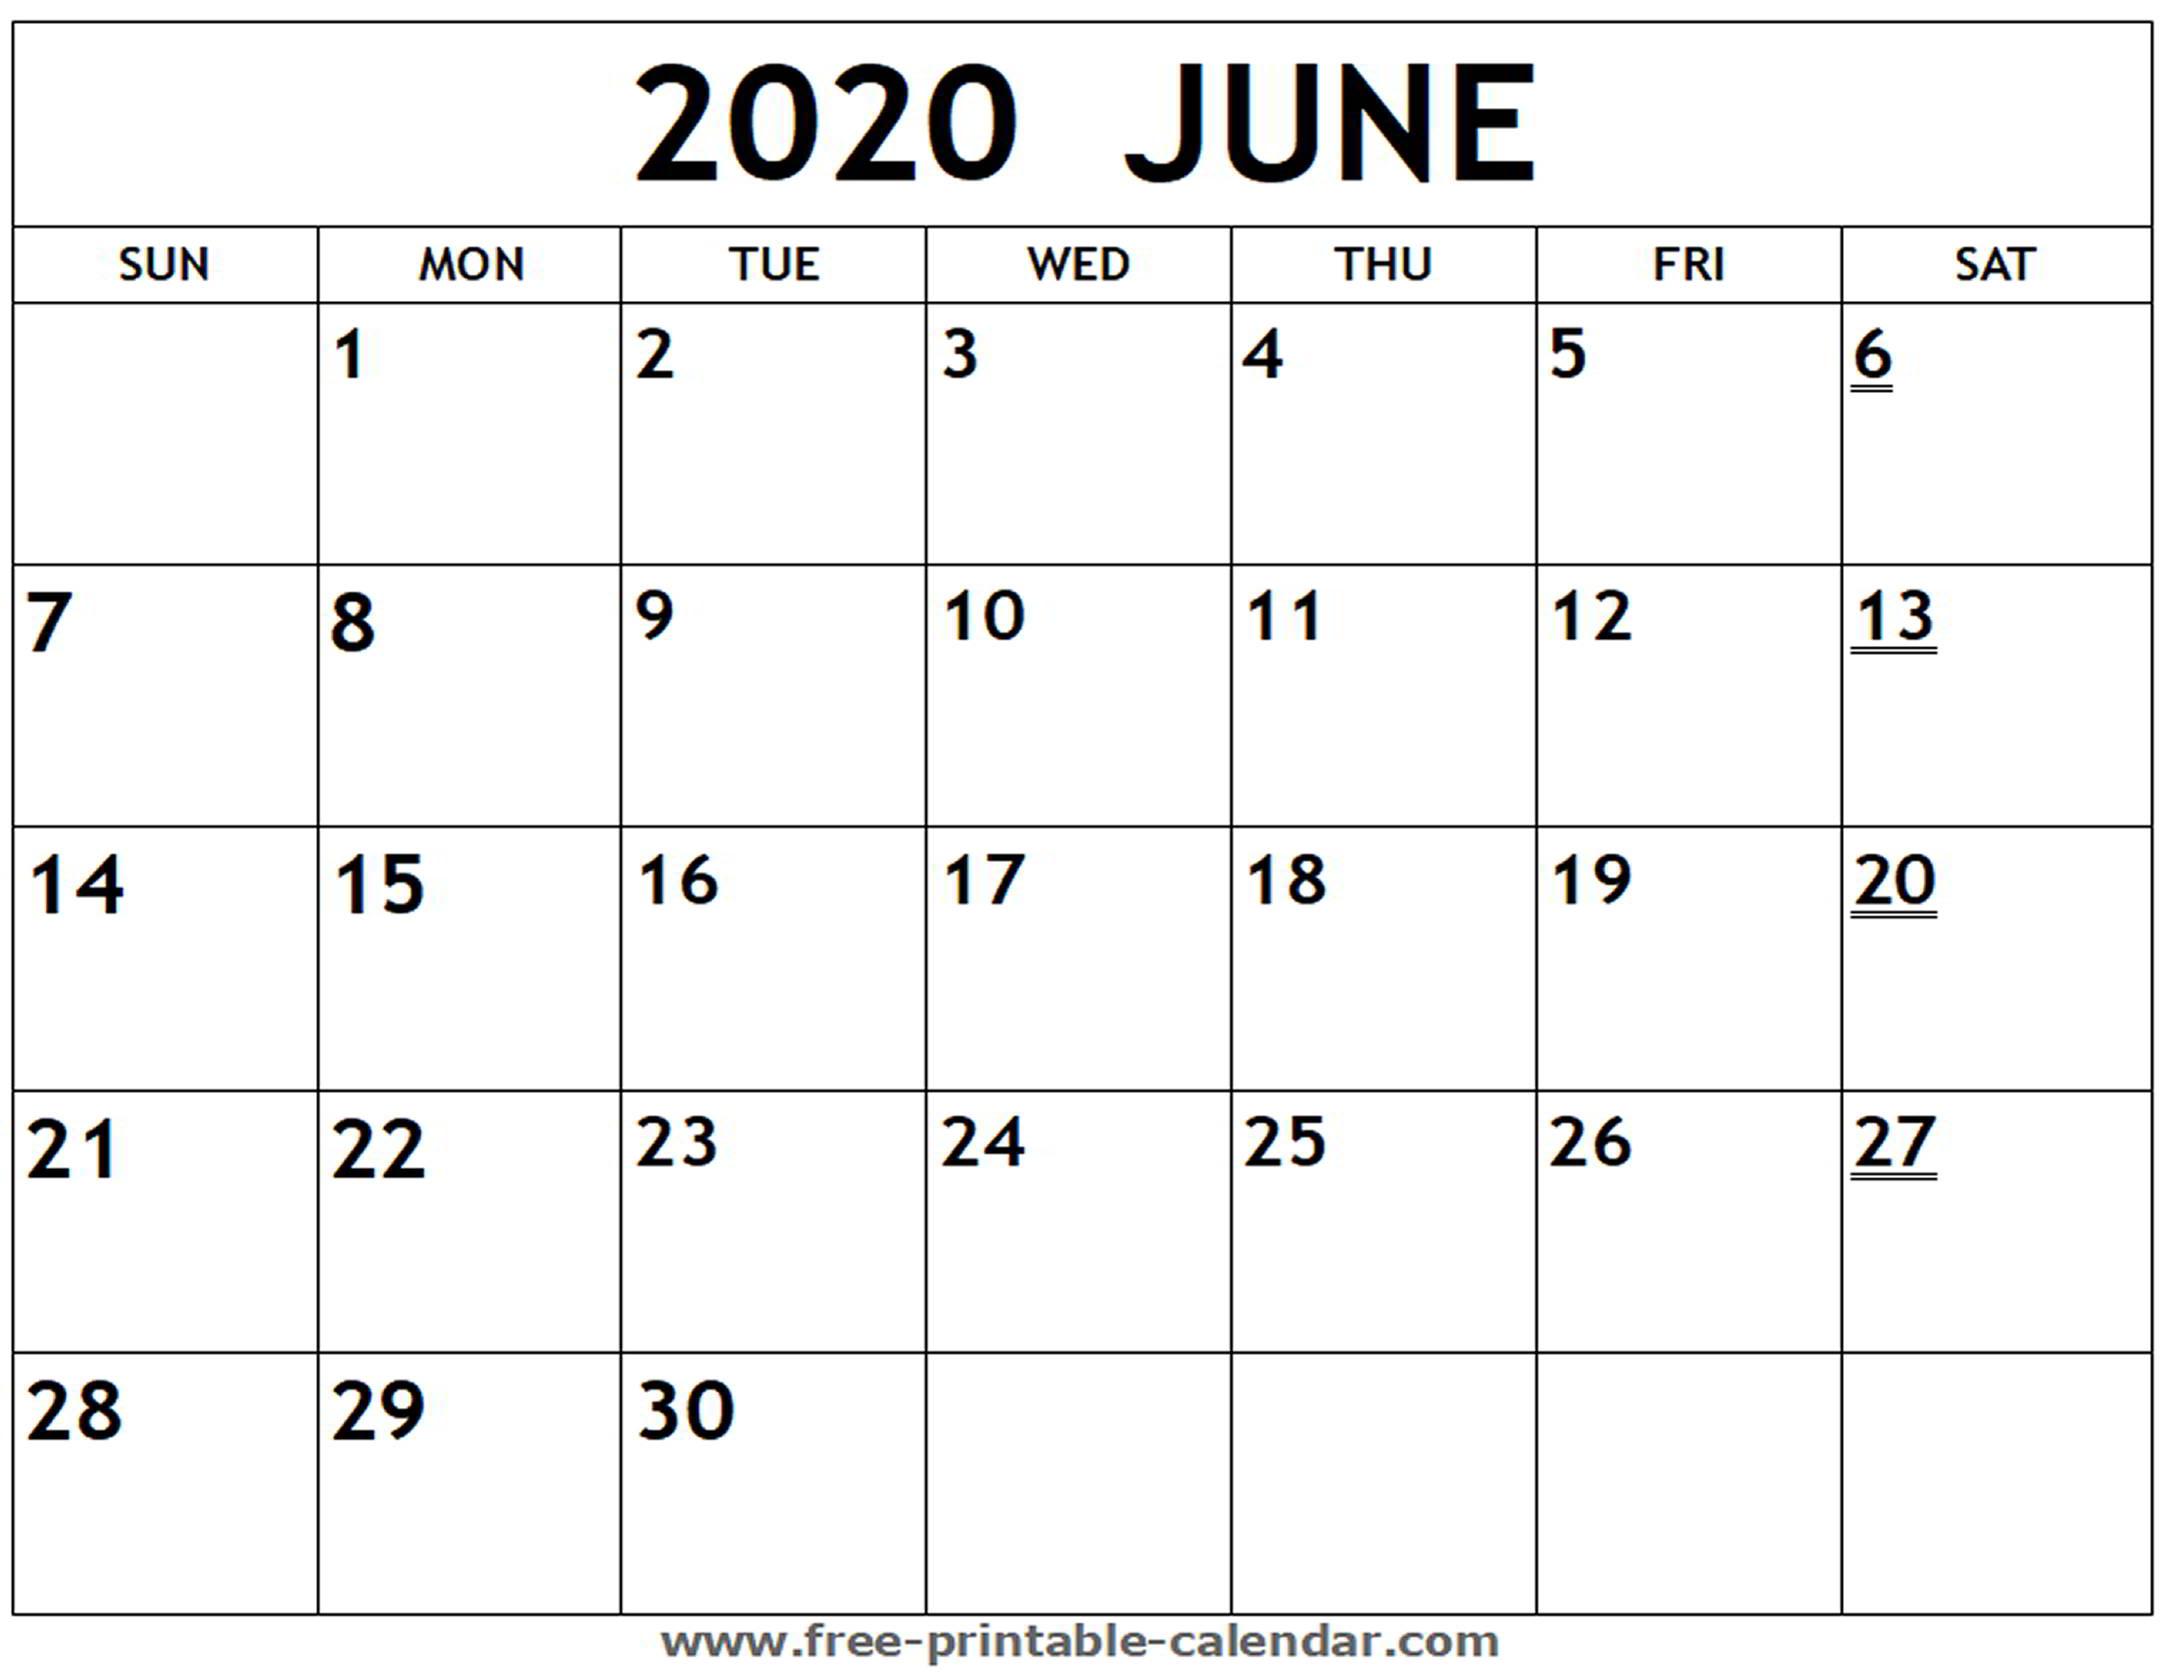 2020 June Calendar - Wpa.wpart.co